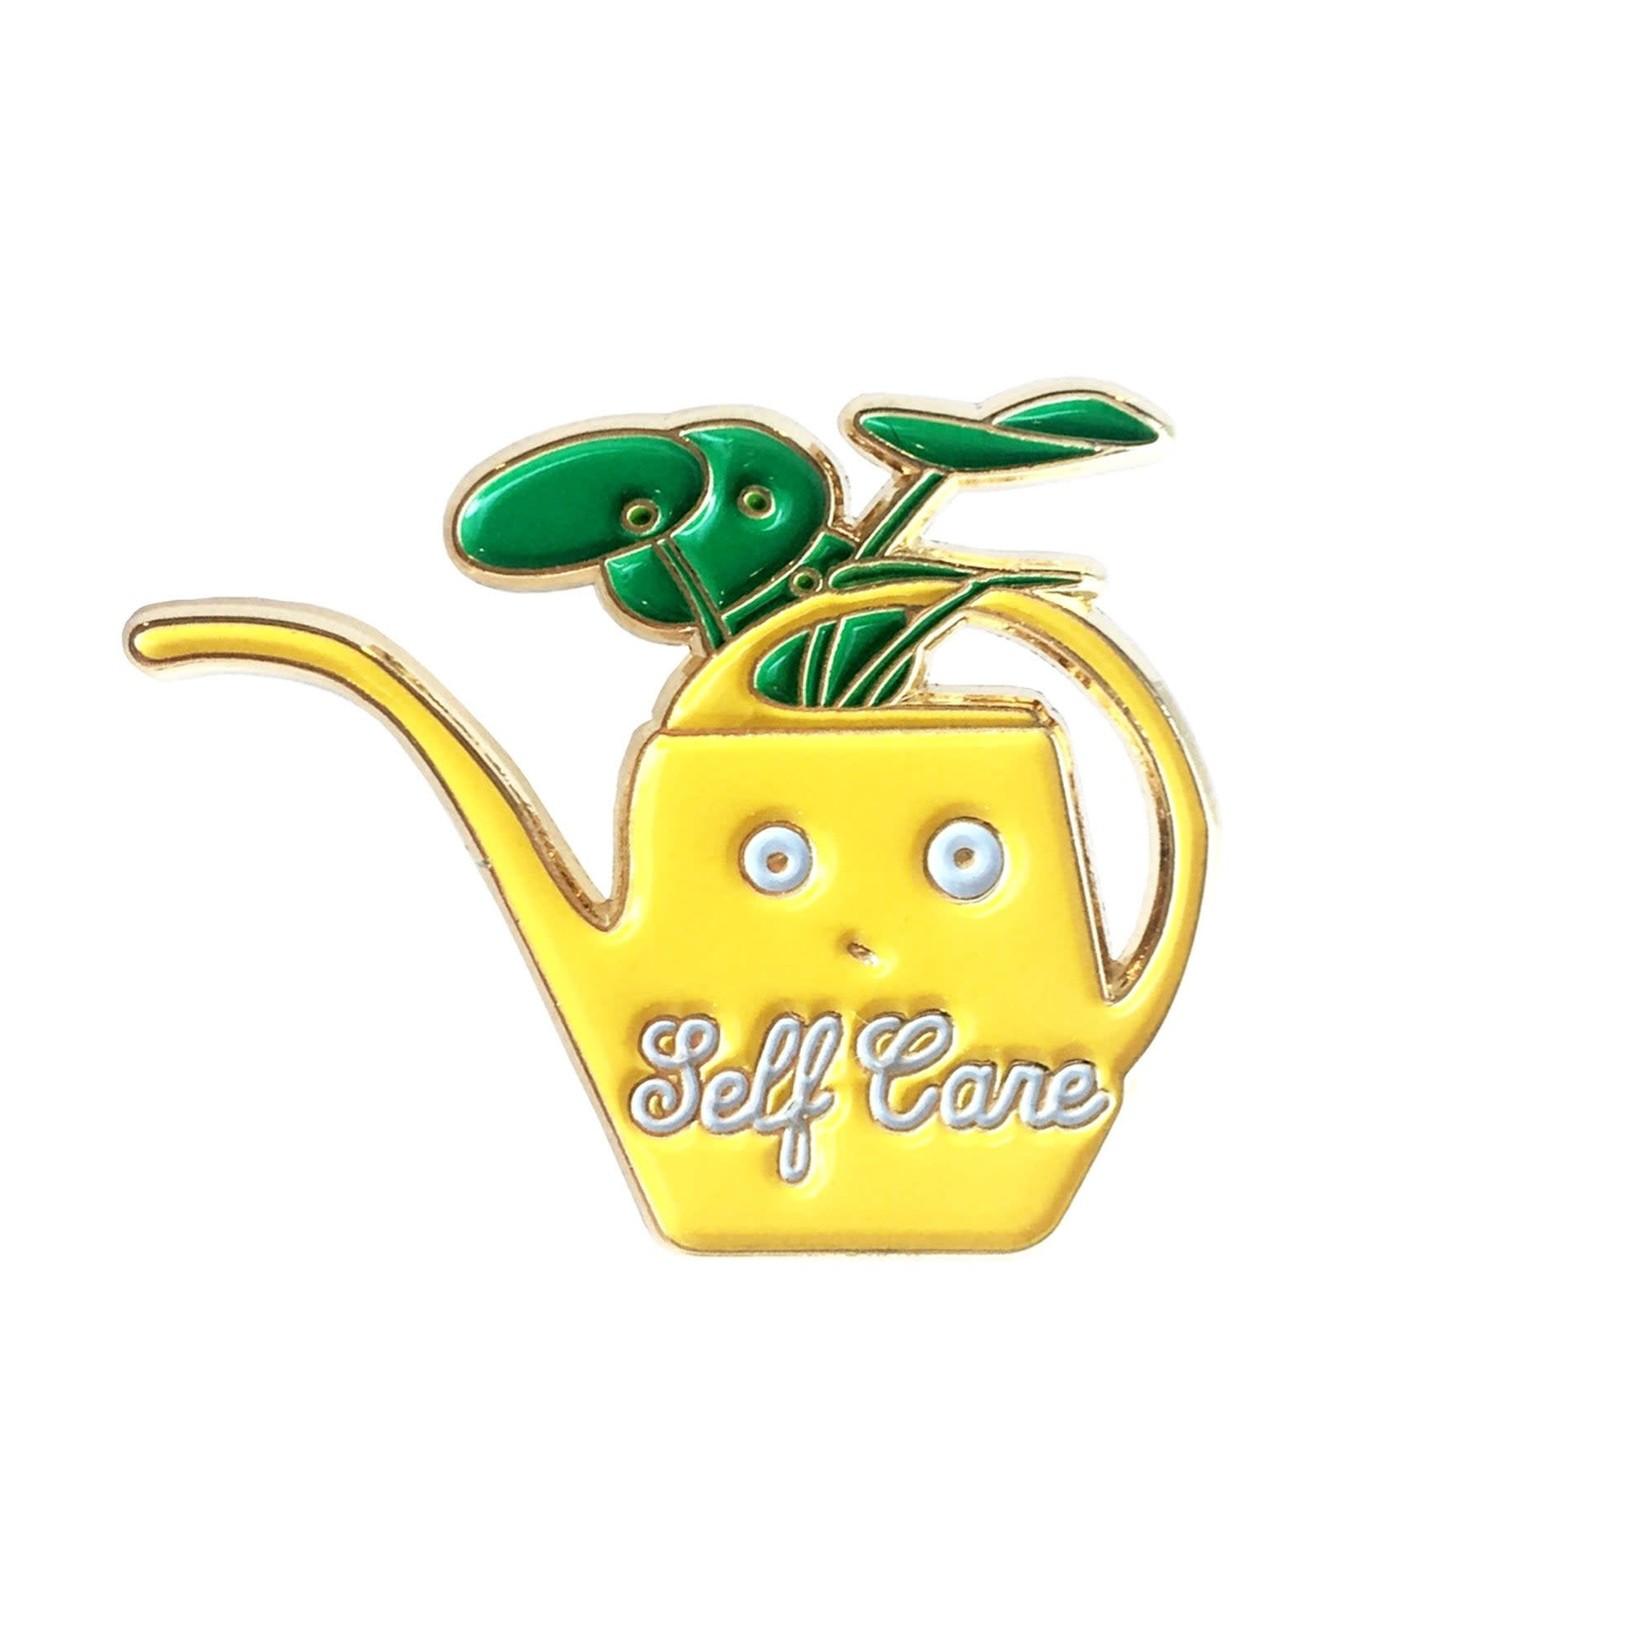 ILOOTPAPERIE Self Care Vintage Yellow Watering Can Enamel Pin